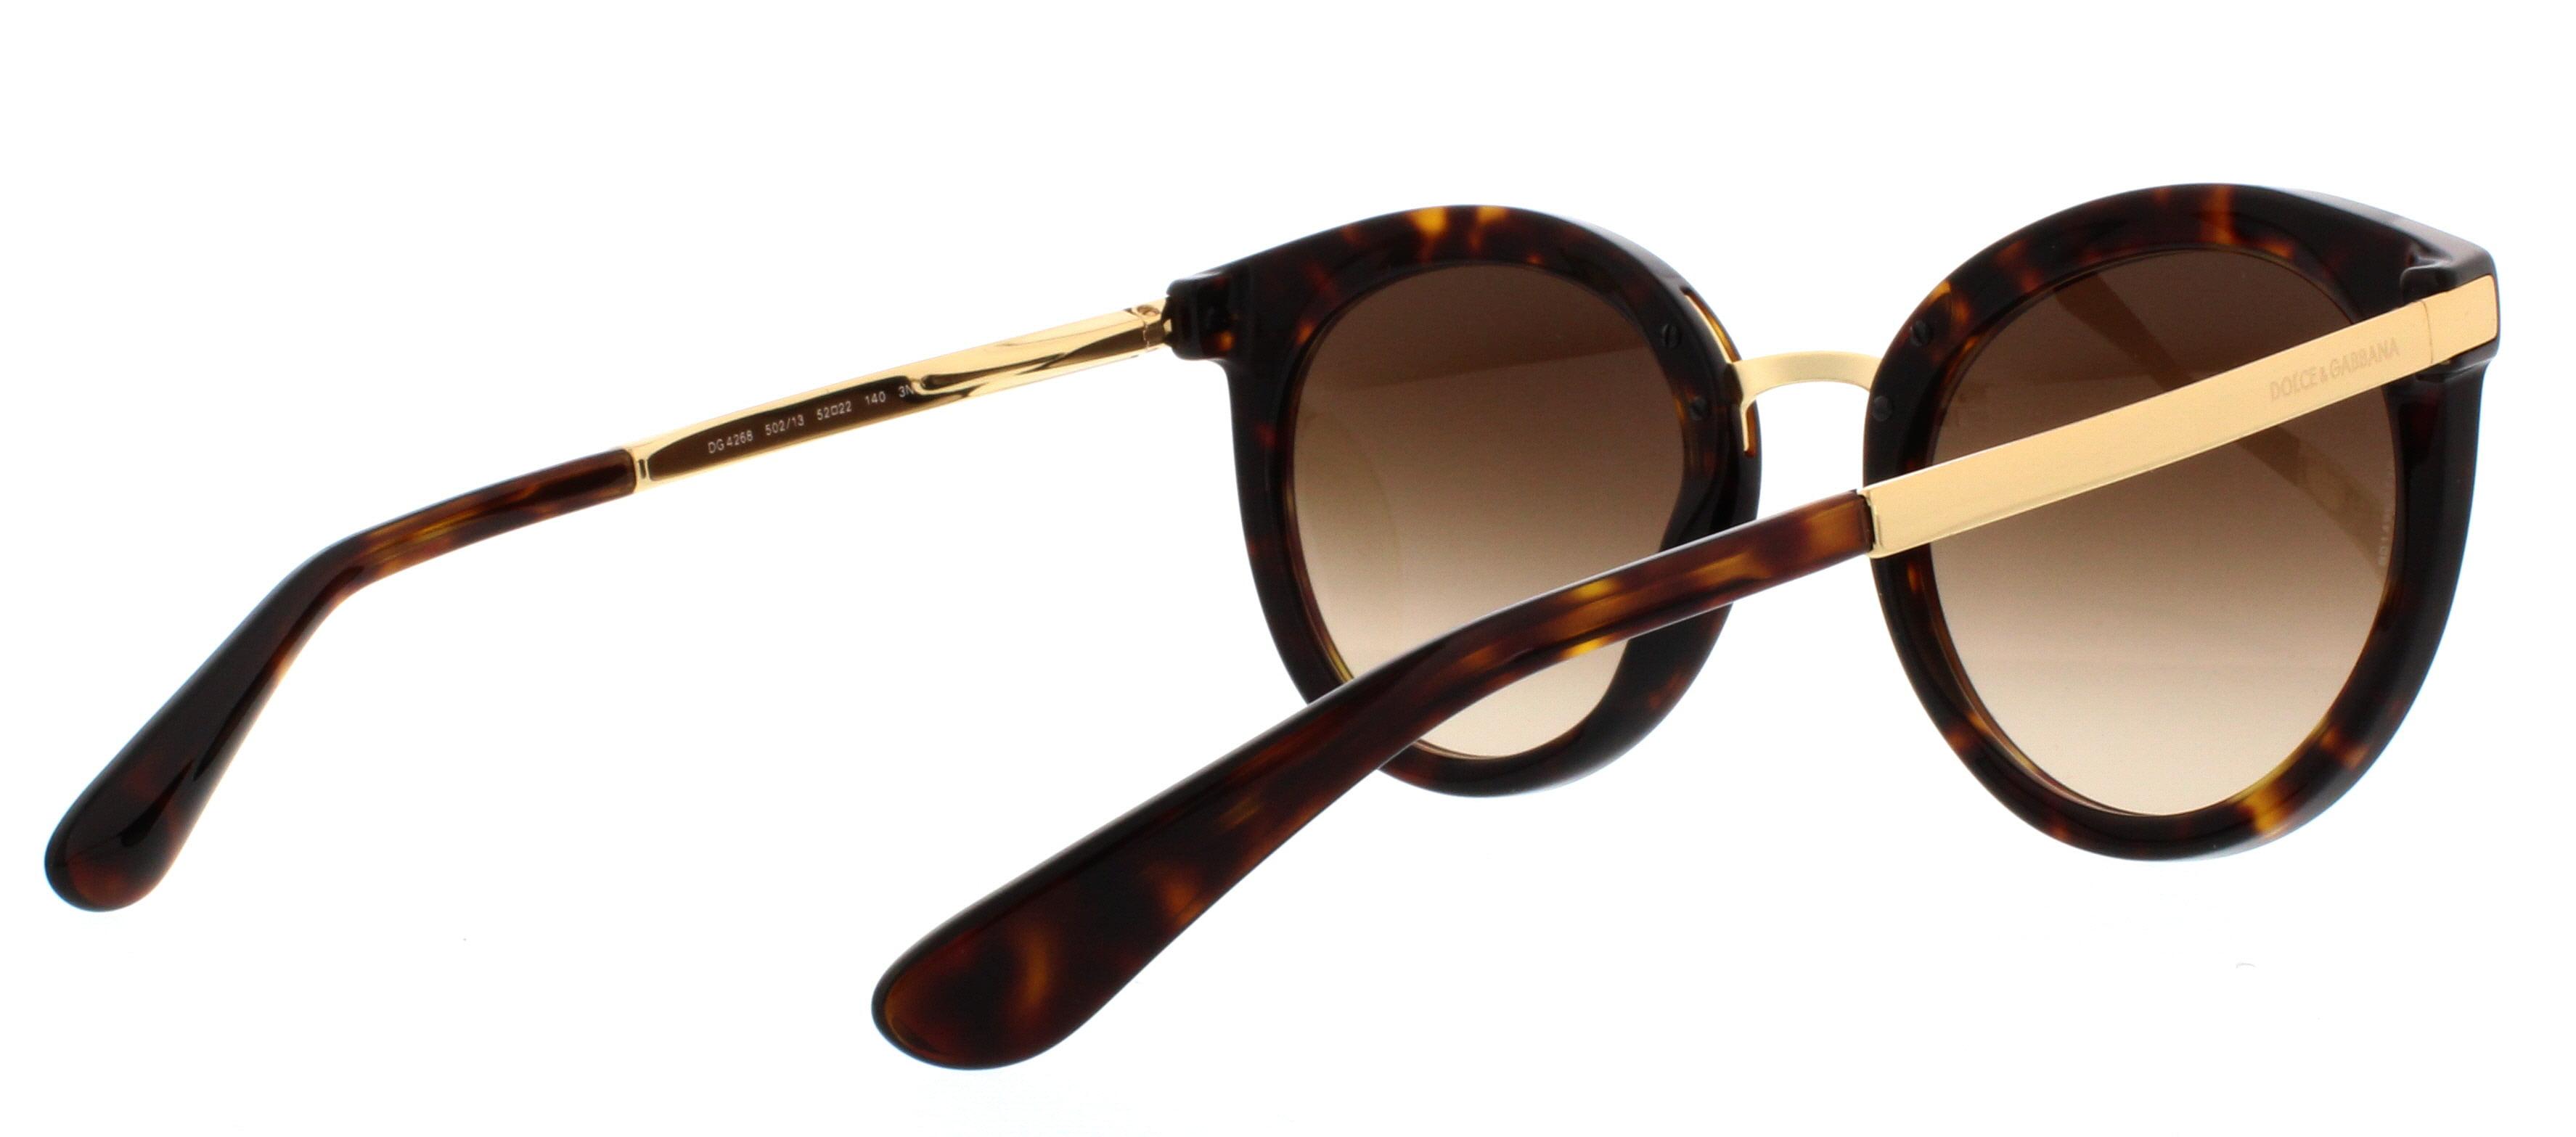 2448e3e62d66bc Dolce   Gabbana DG4268 Source · Dolce   Gabbana Dolce   Gabbana Women s  Gradient DG4268 501 ...